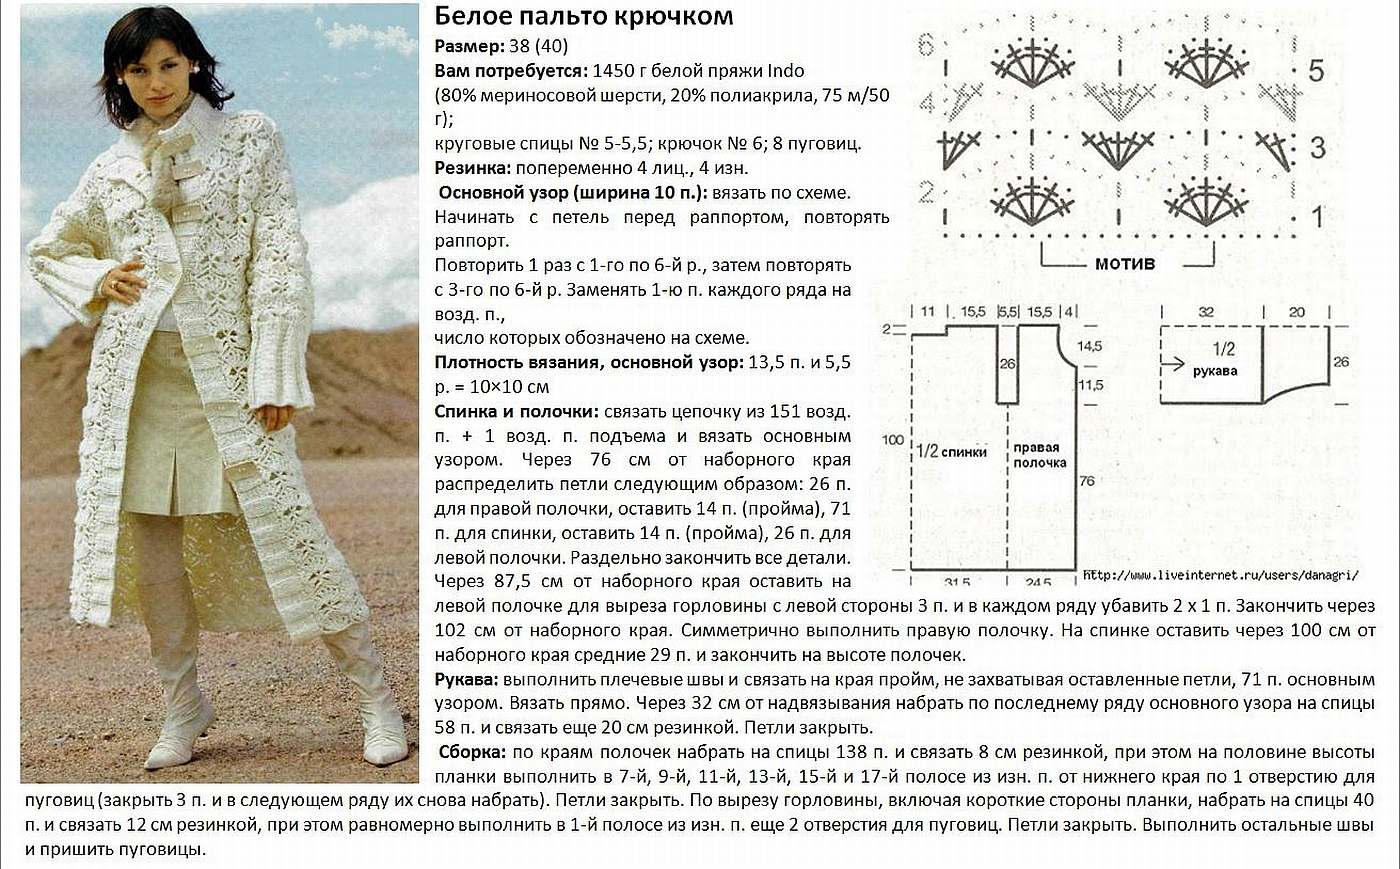 palto krjuchkom dlja zhenshhin - Вязаное пальто крючком для женщин схемы и описание